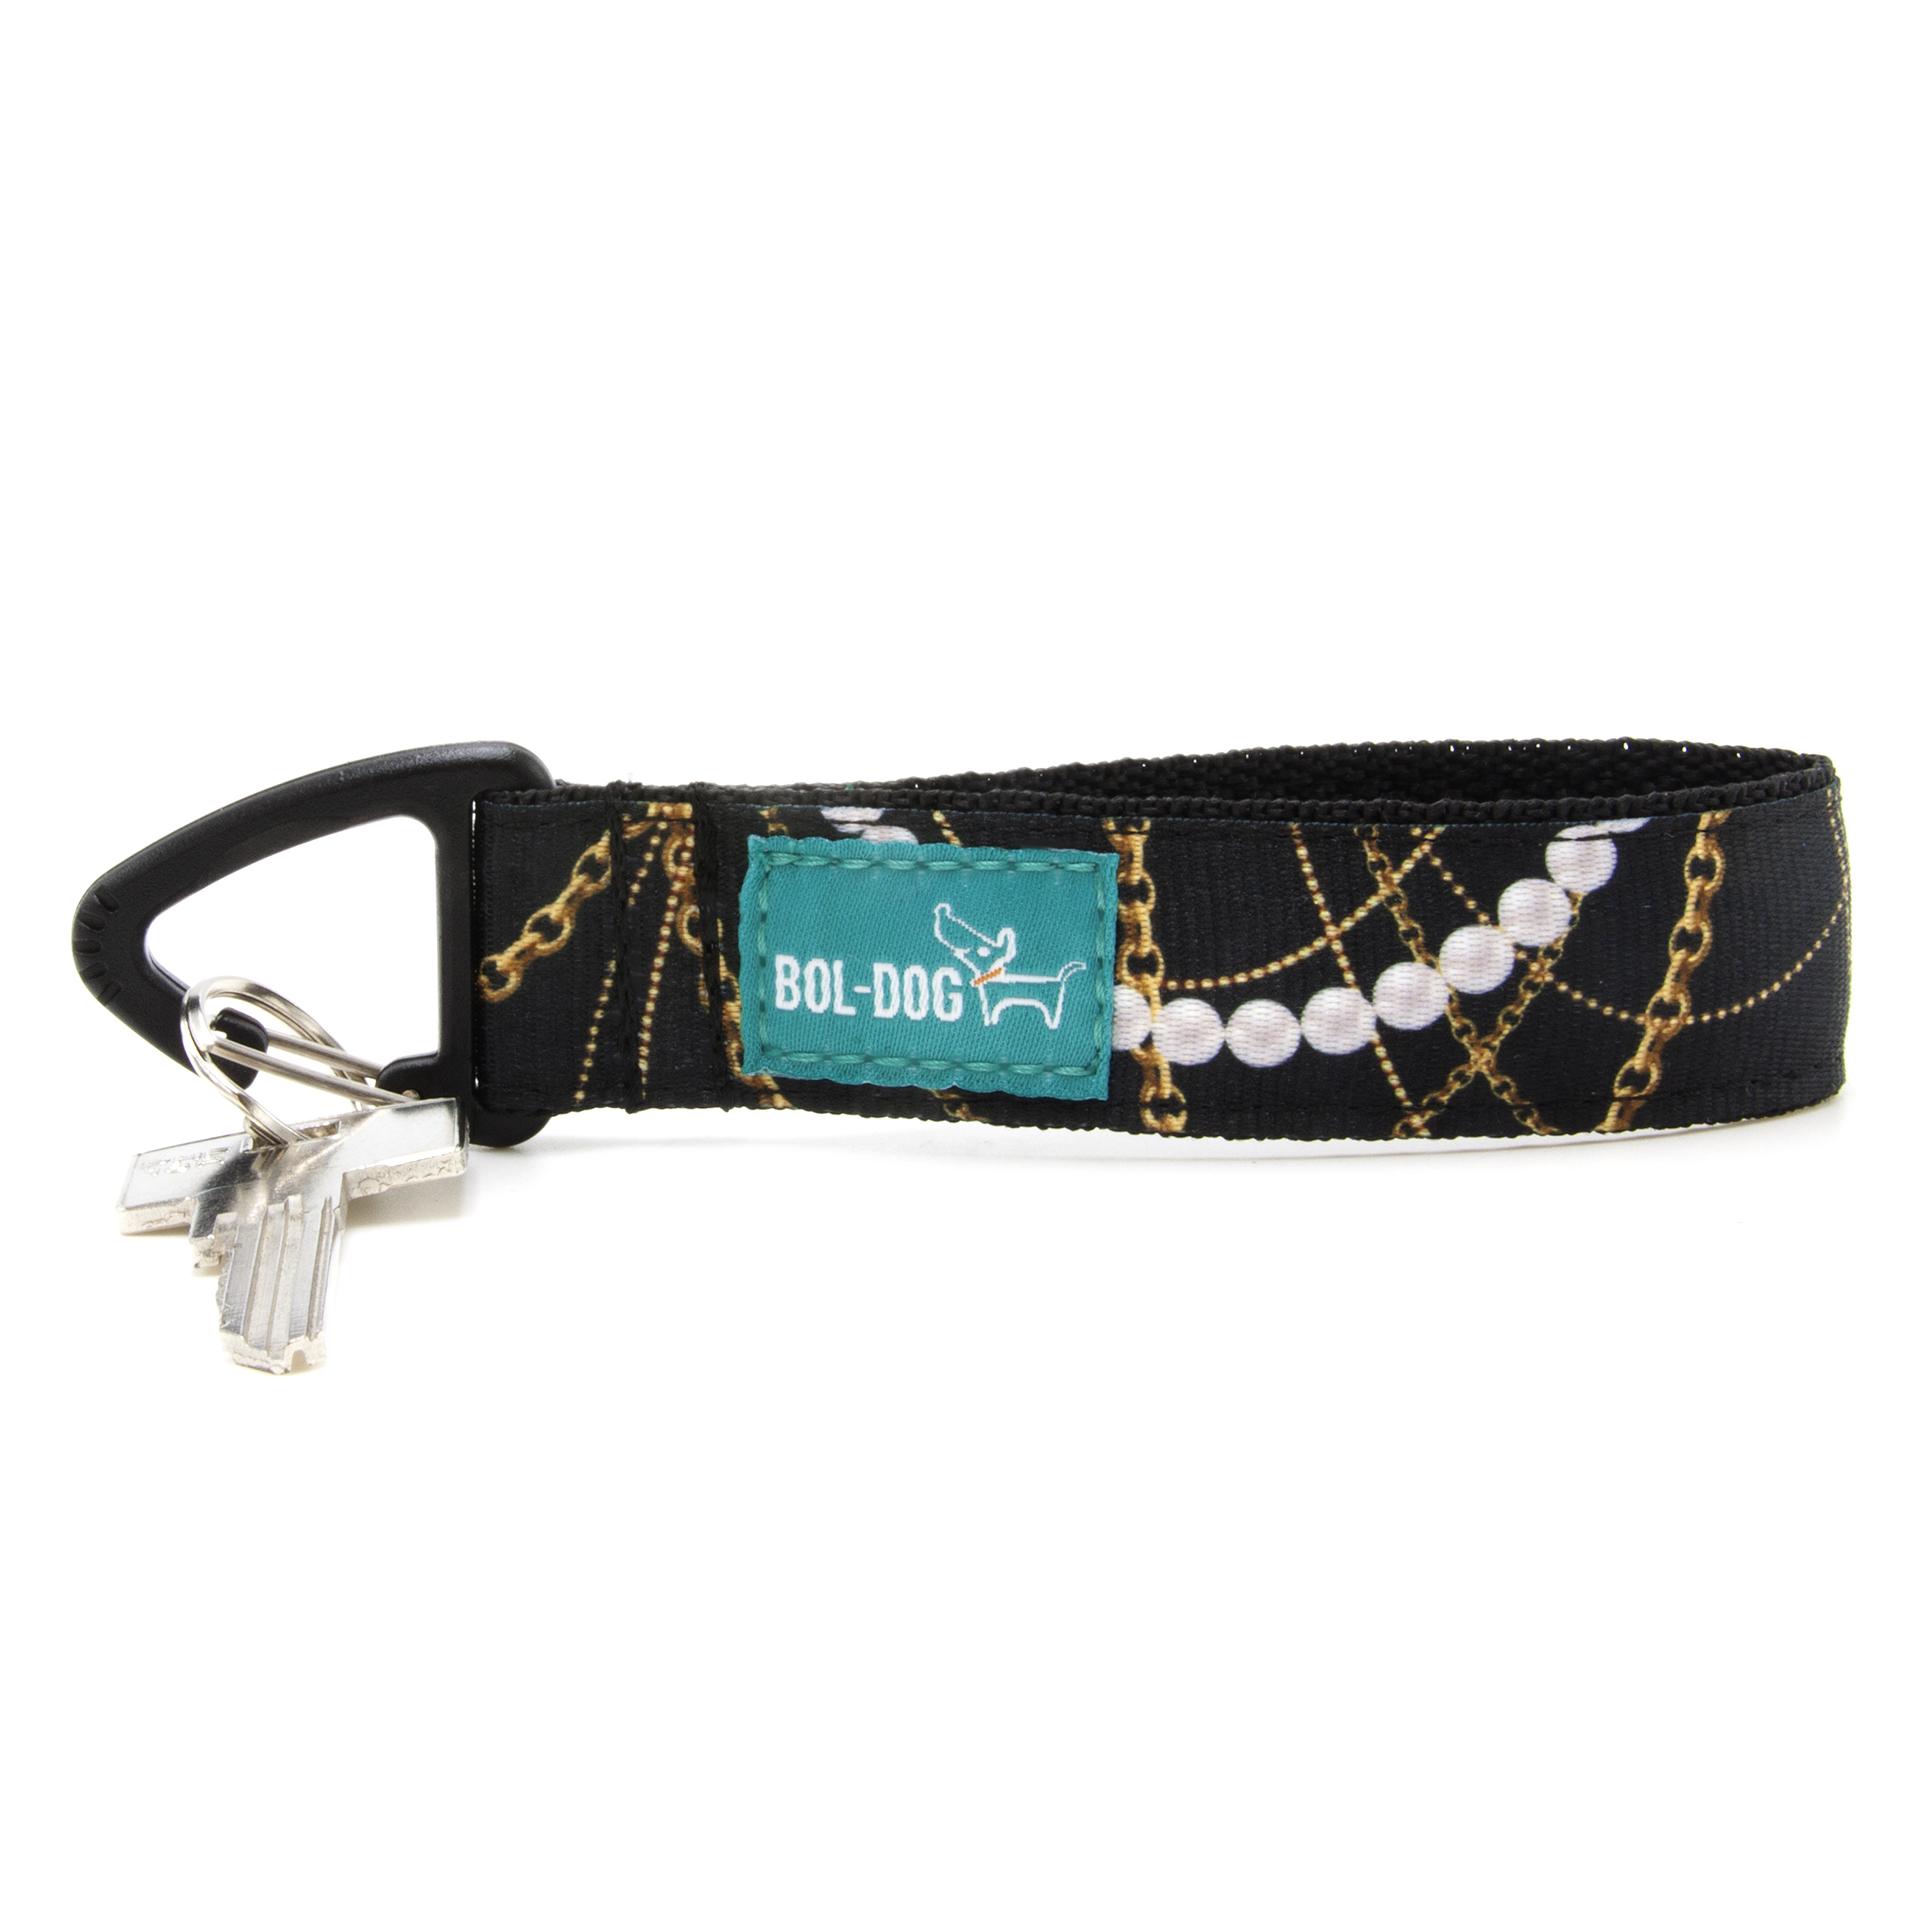 Necklace key holder